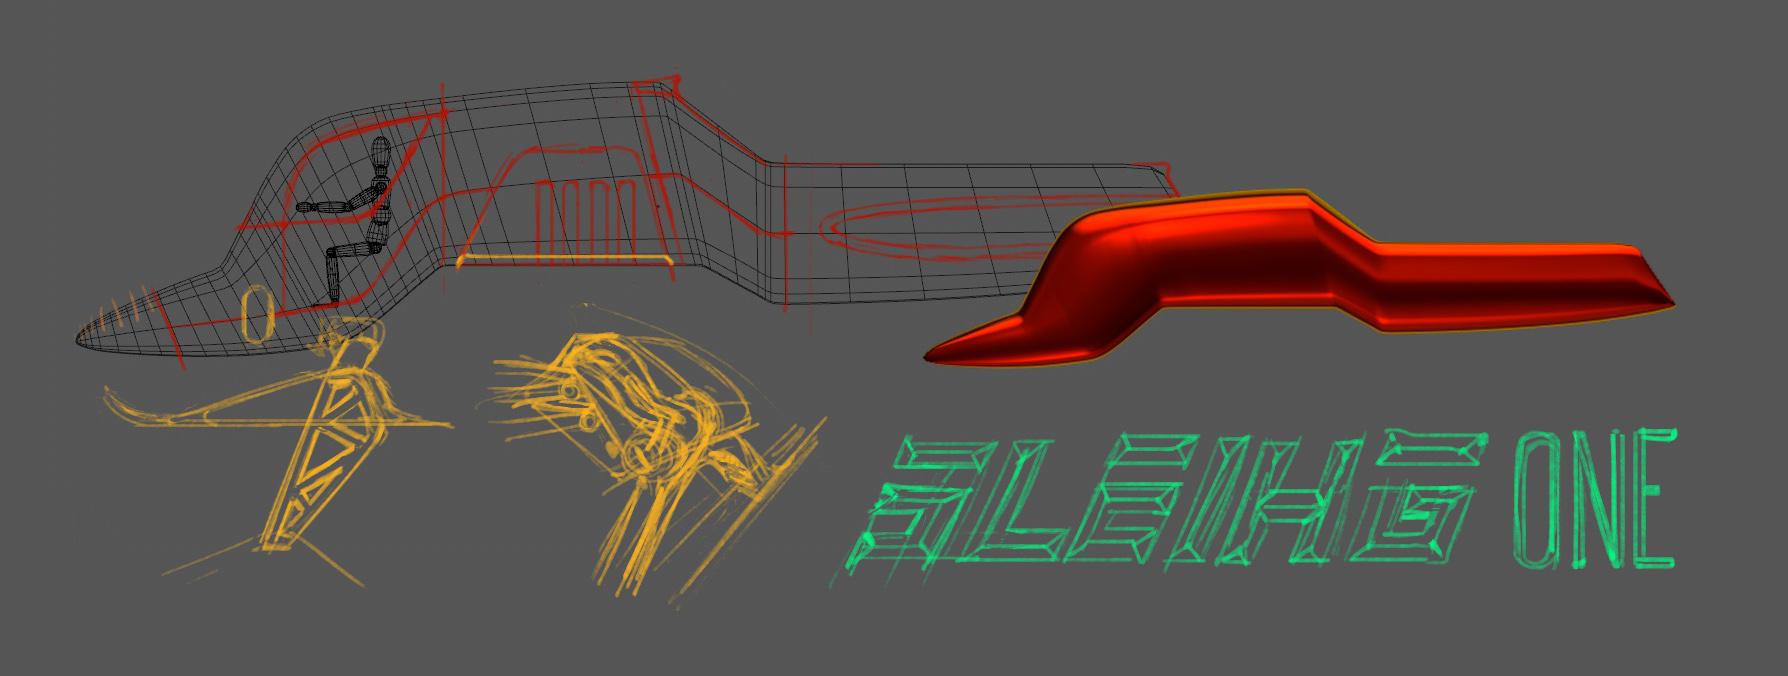 Sleigh One Sketch